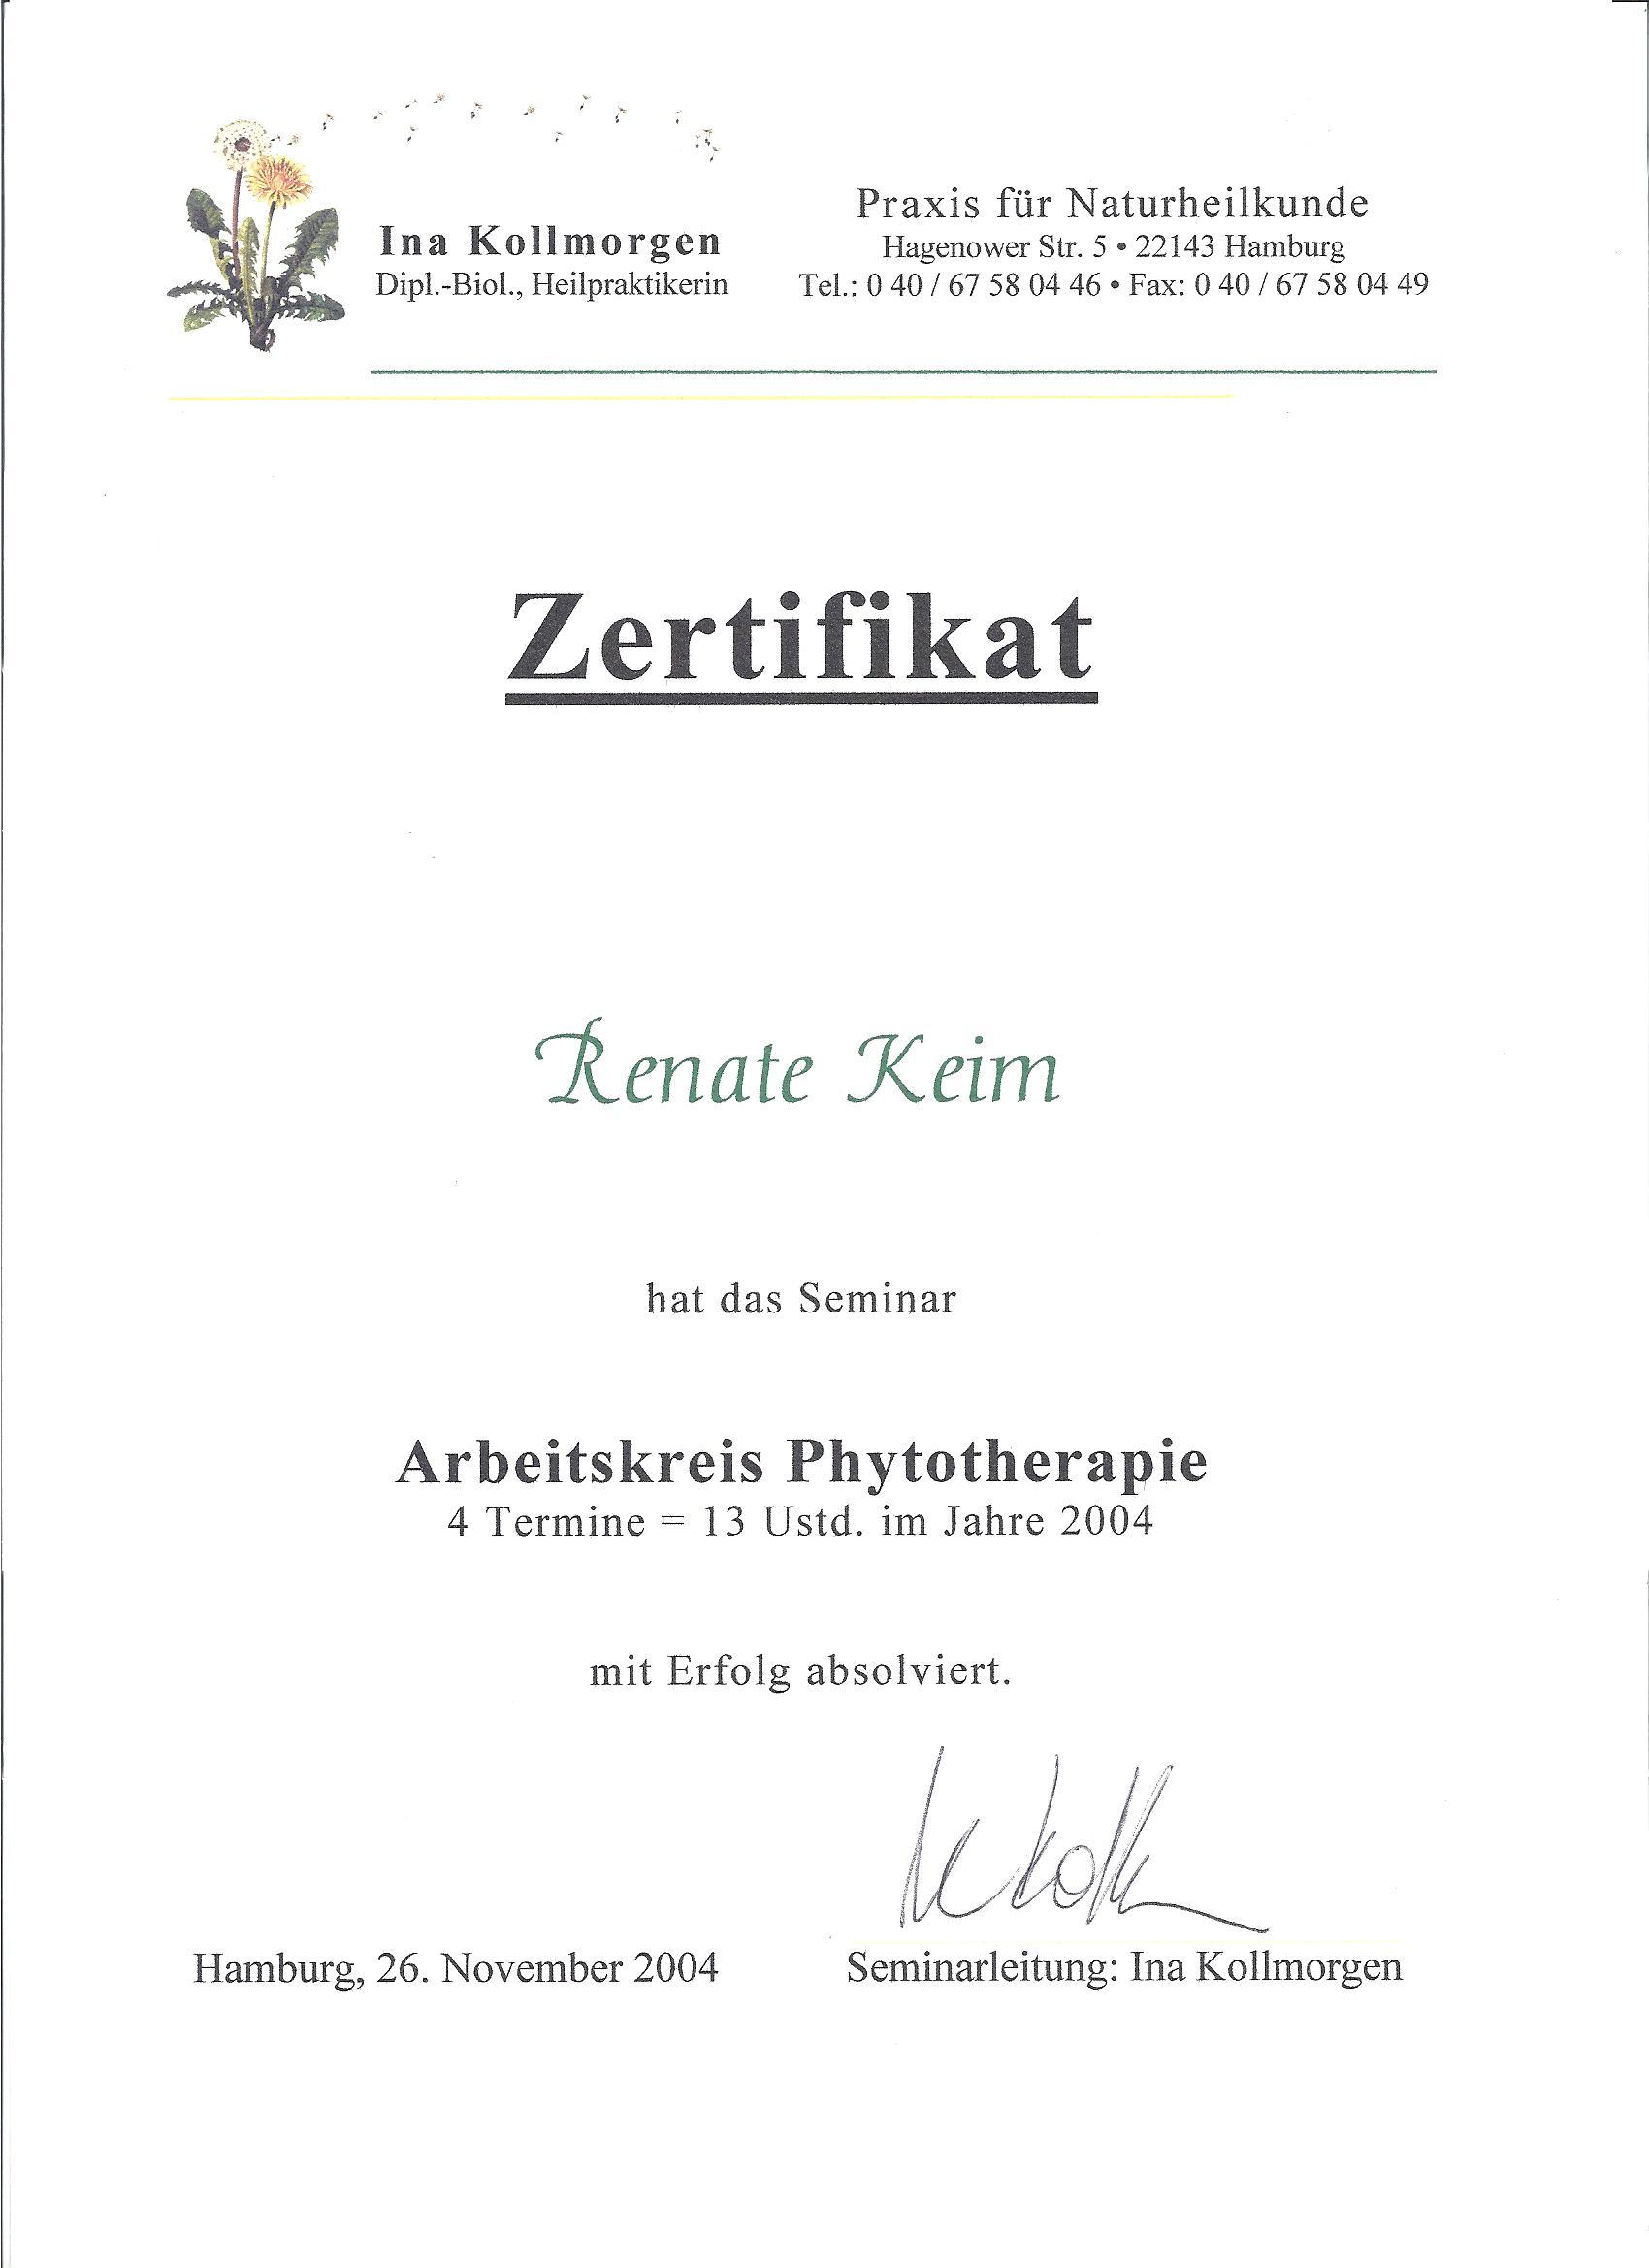 Arbeitskreis Phytotherapie 2004